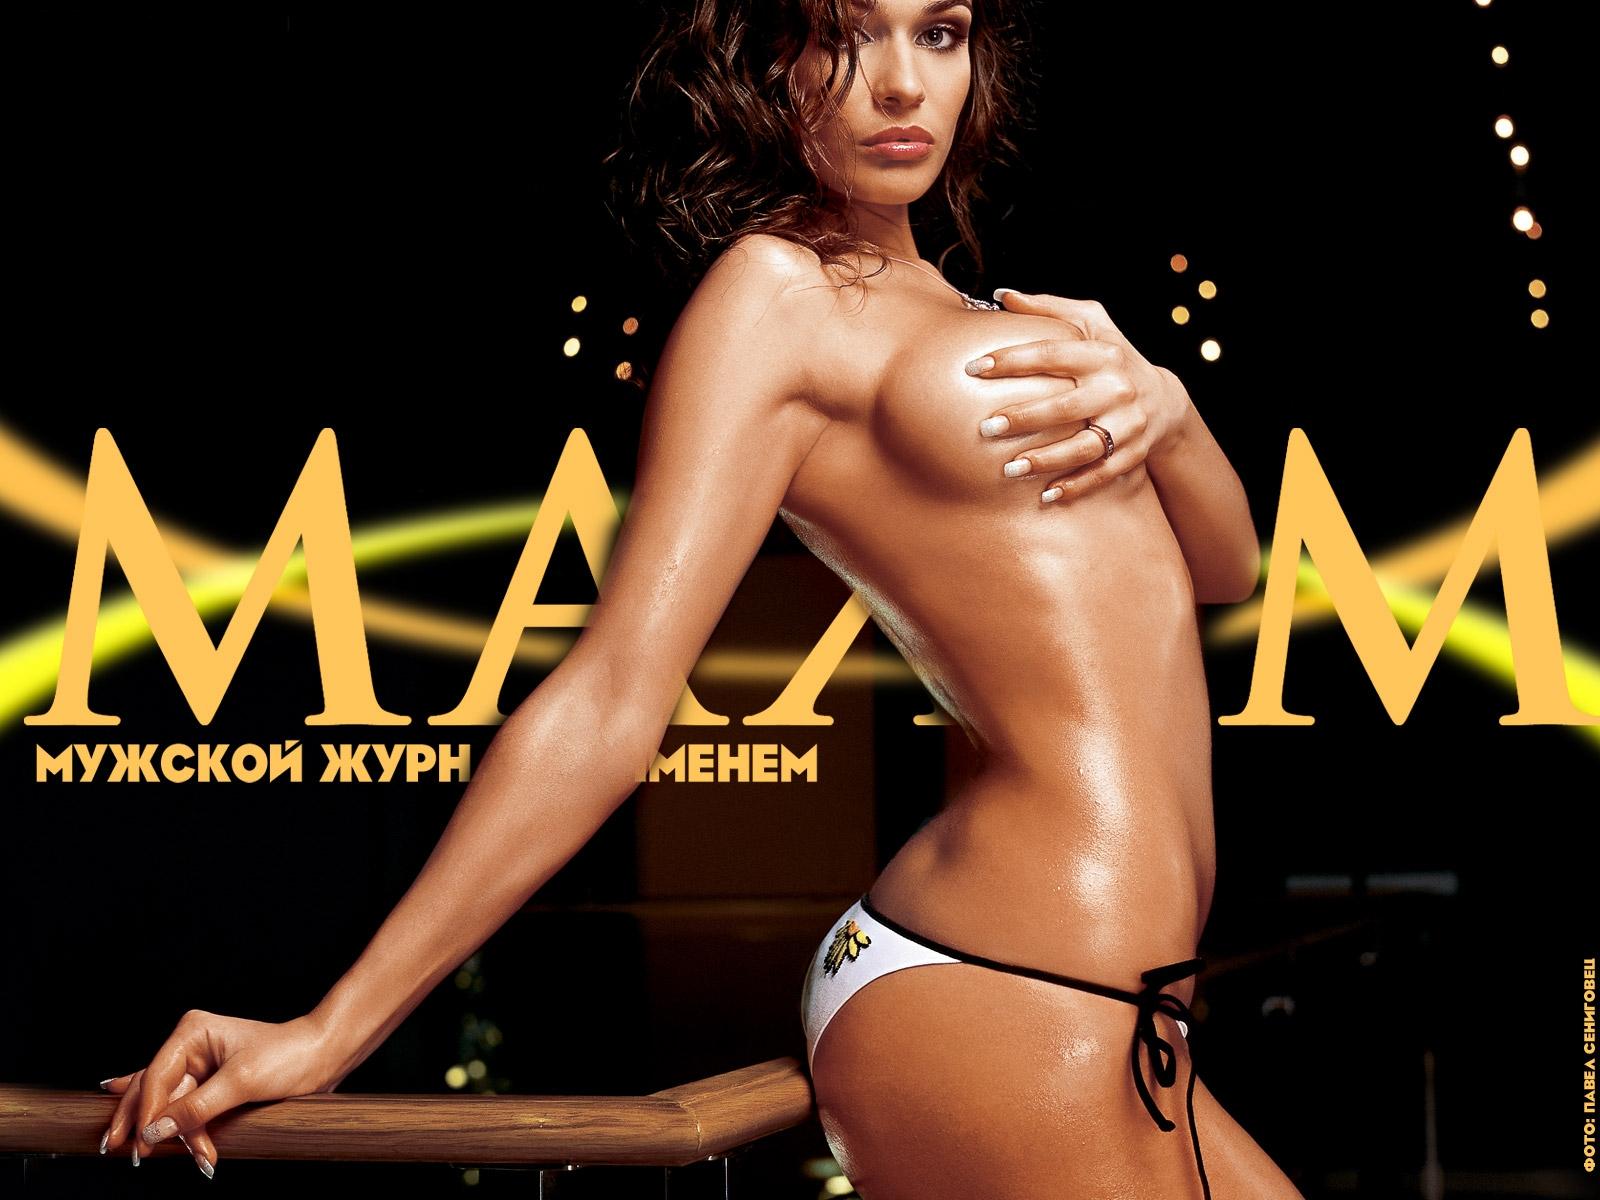 foto-bez-kupyur-iz-zhurnala-maksim-porno-super-anus-so-starushkami